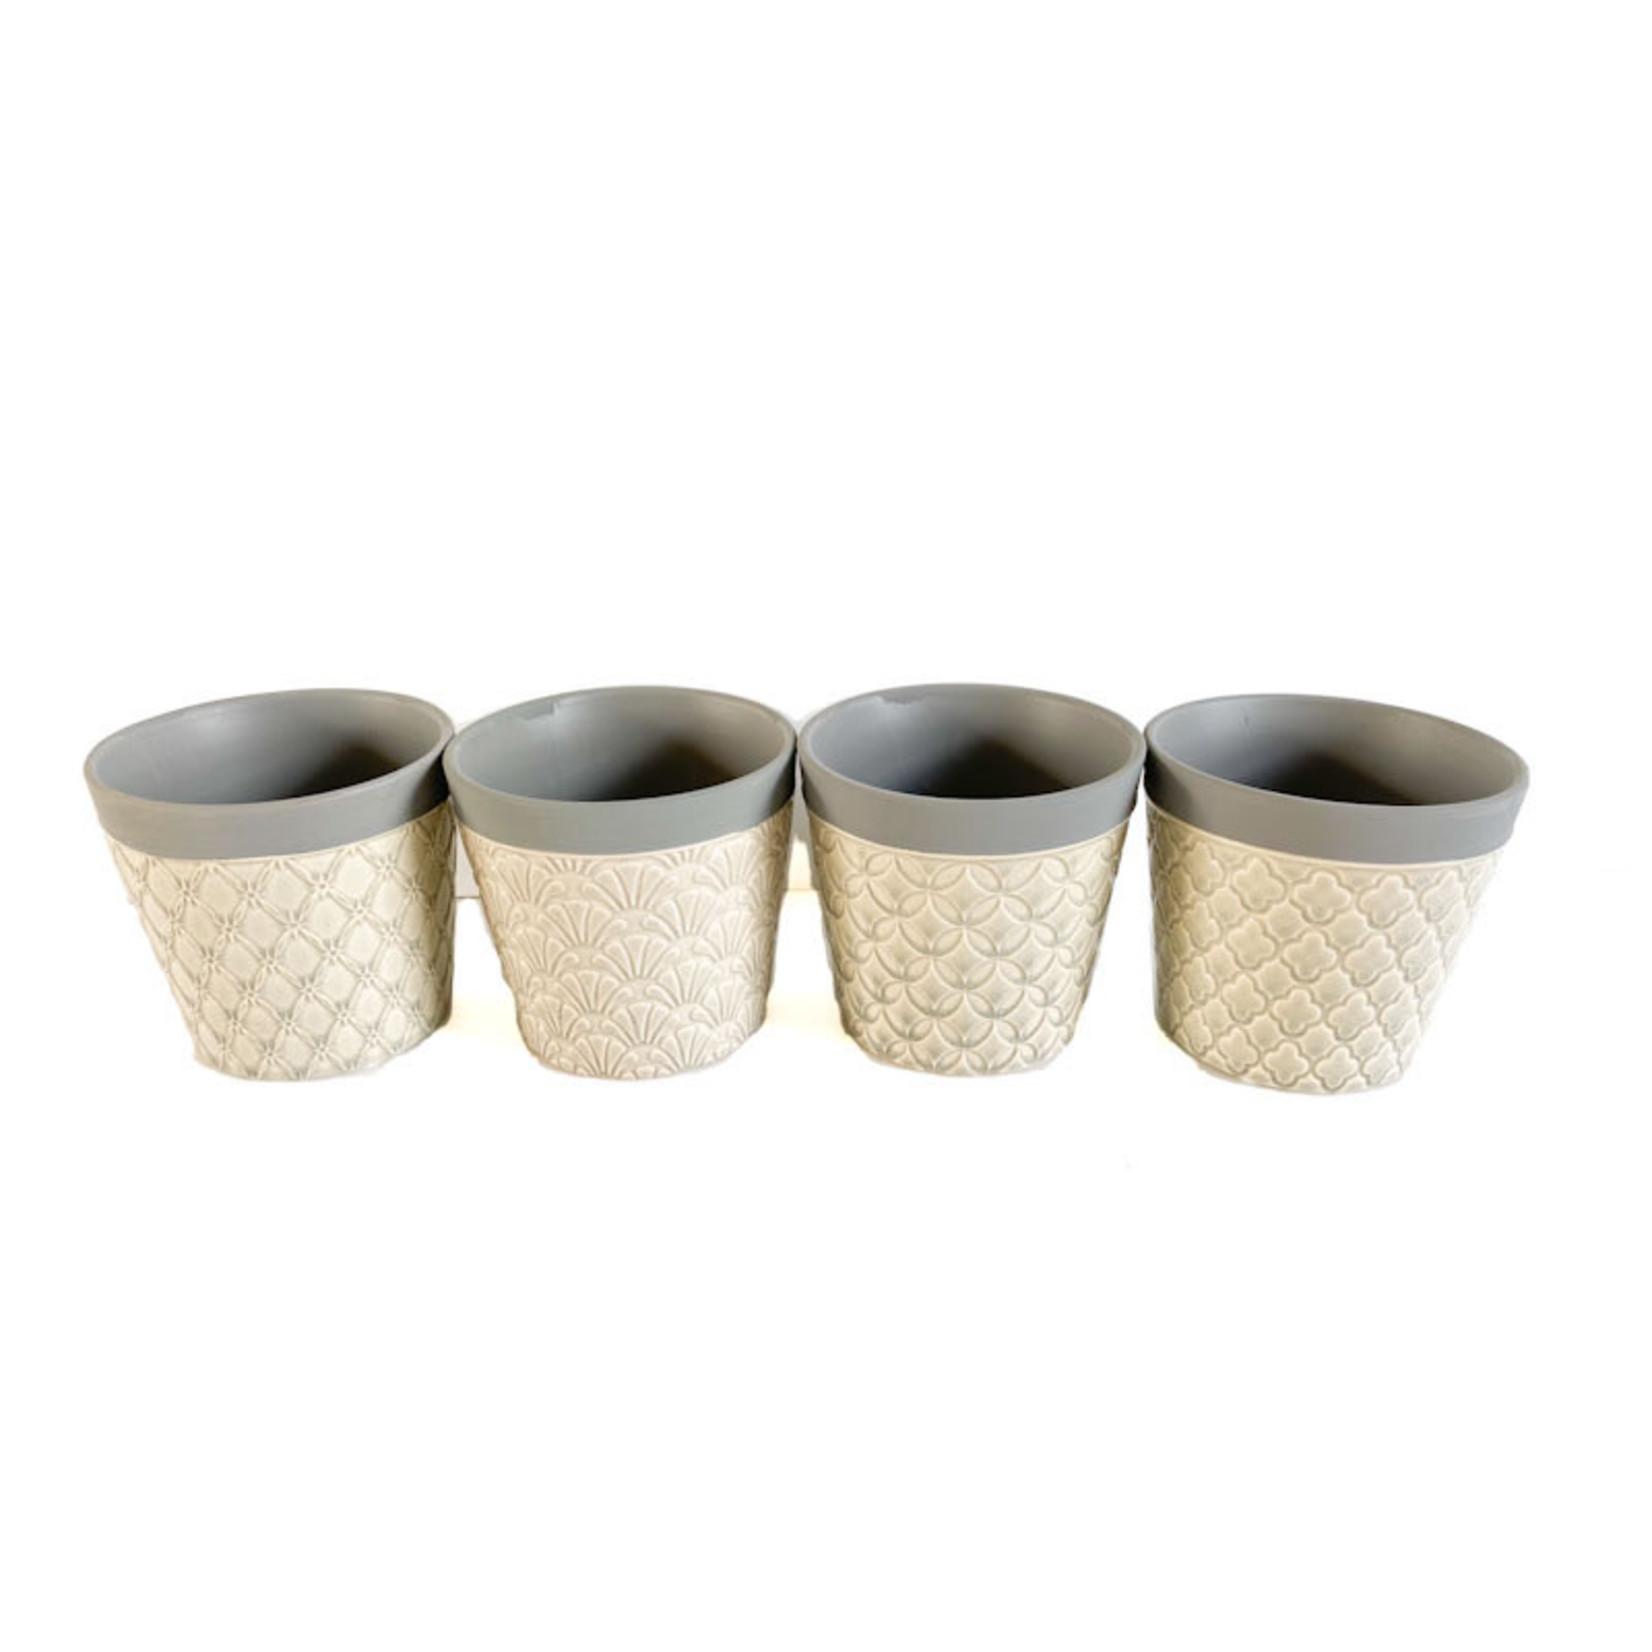 Pot - Grey with Cream Pattern